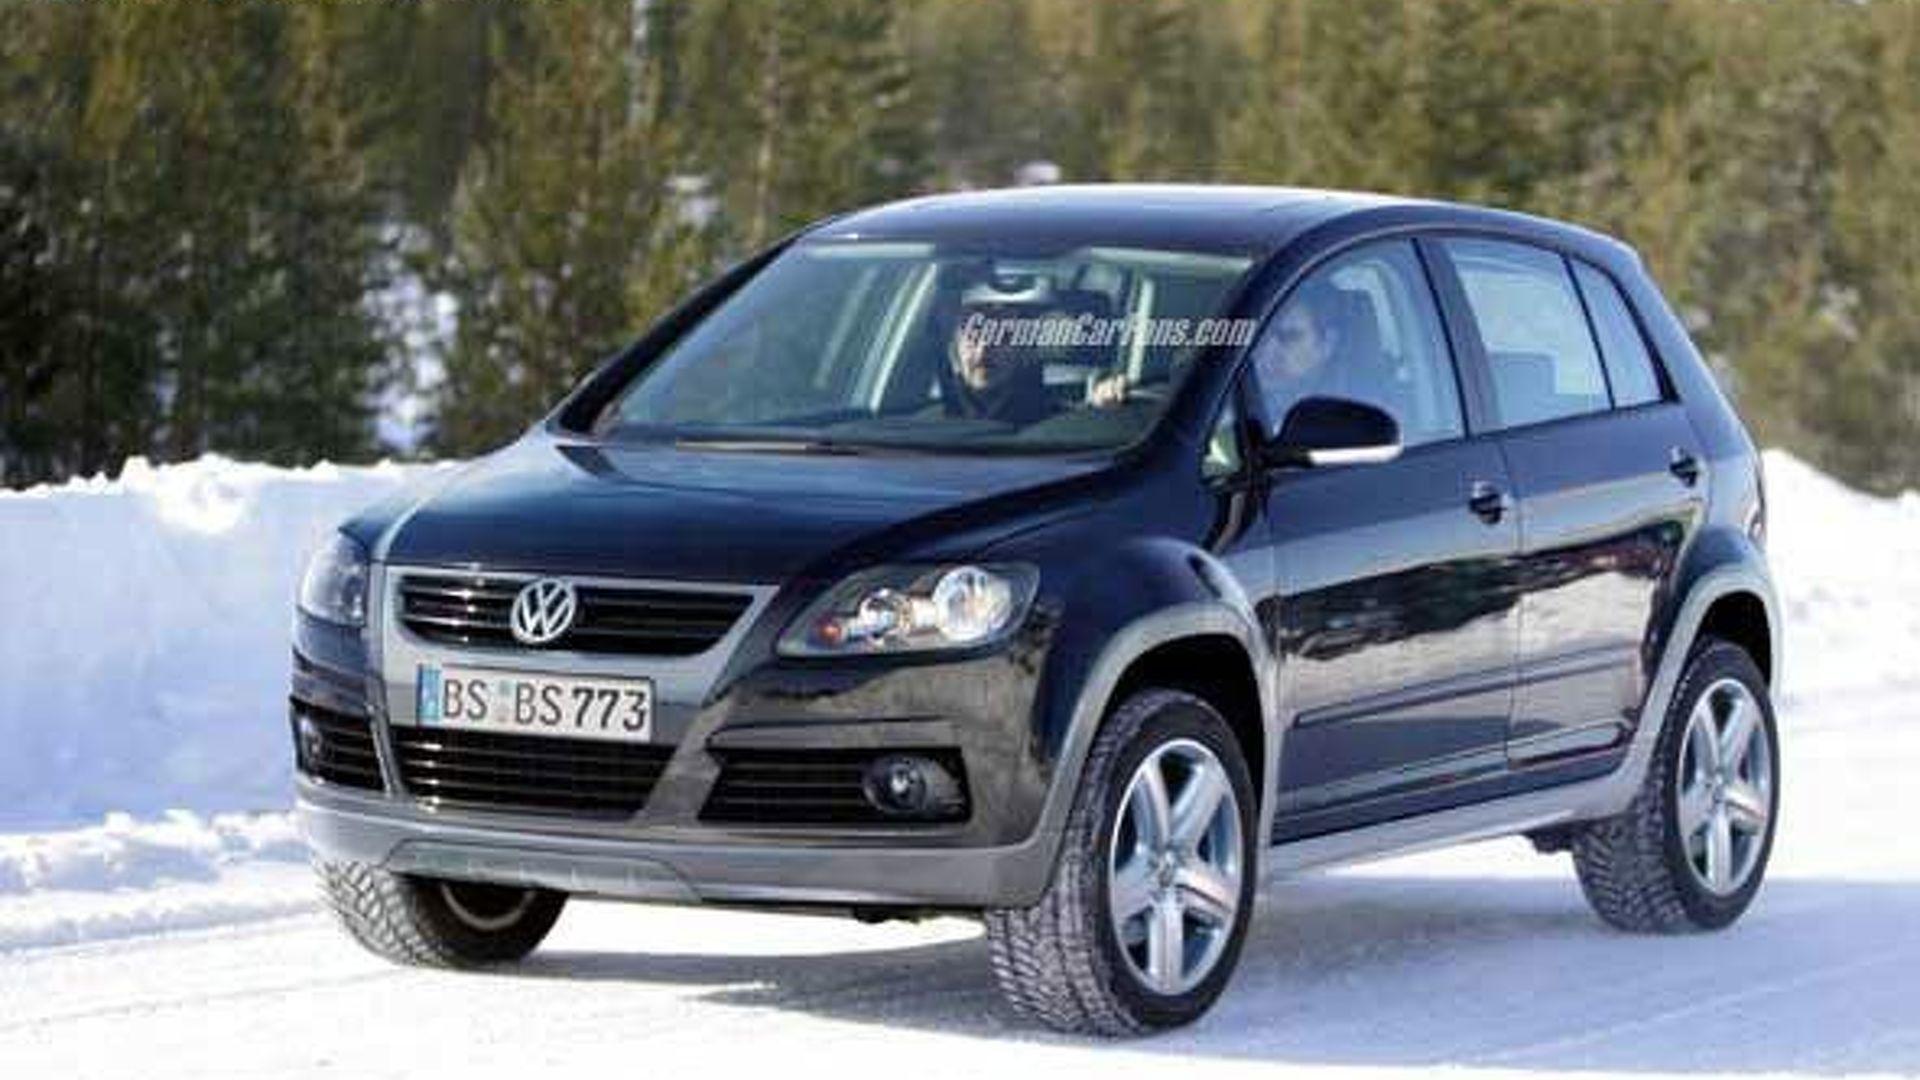 Vw Touareg Spy >> VW Cross Golf SUV Spy Photos